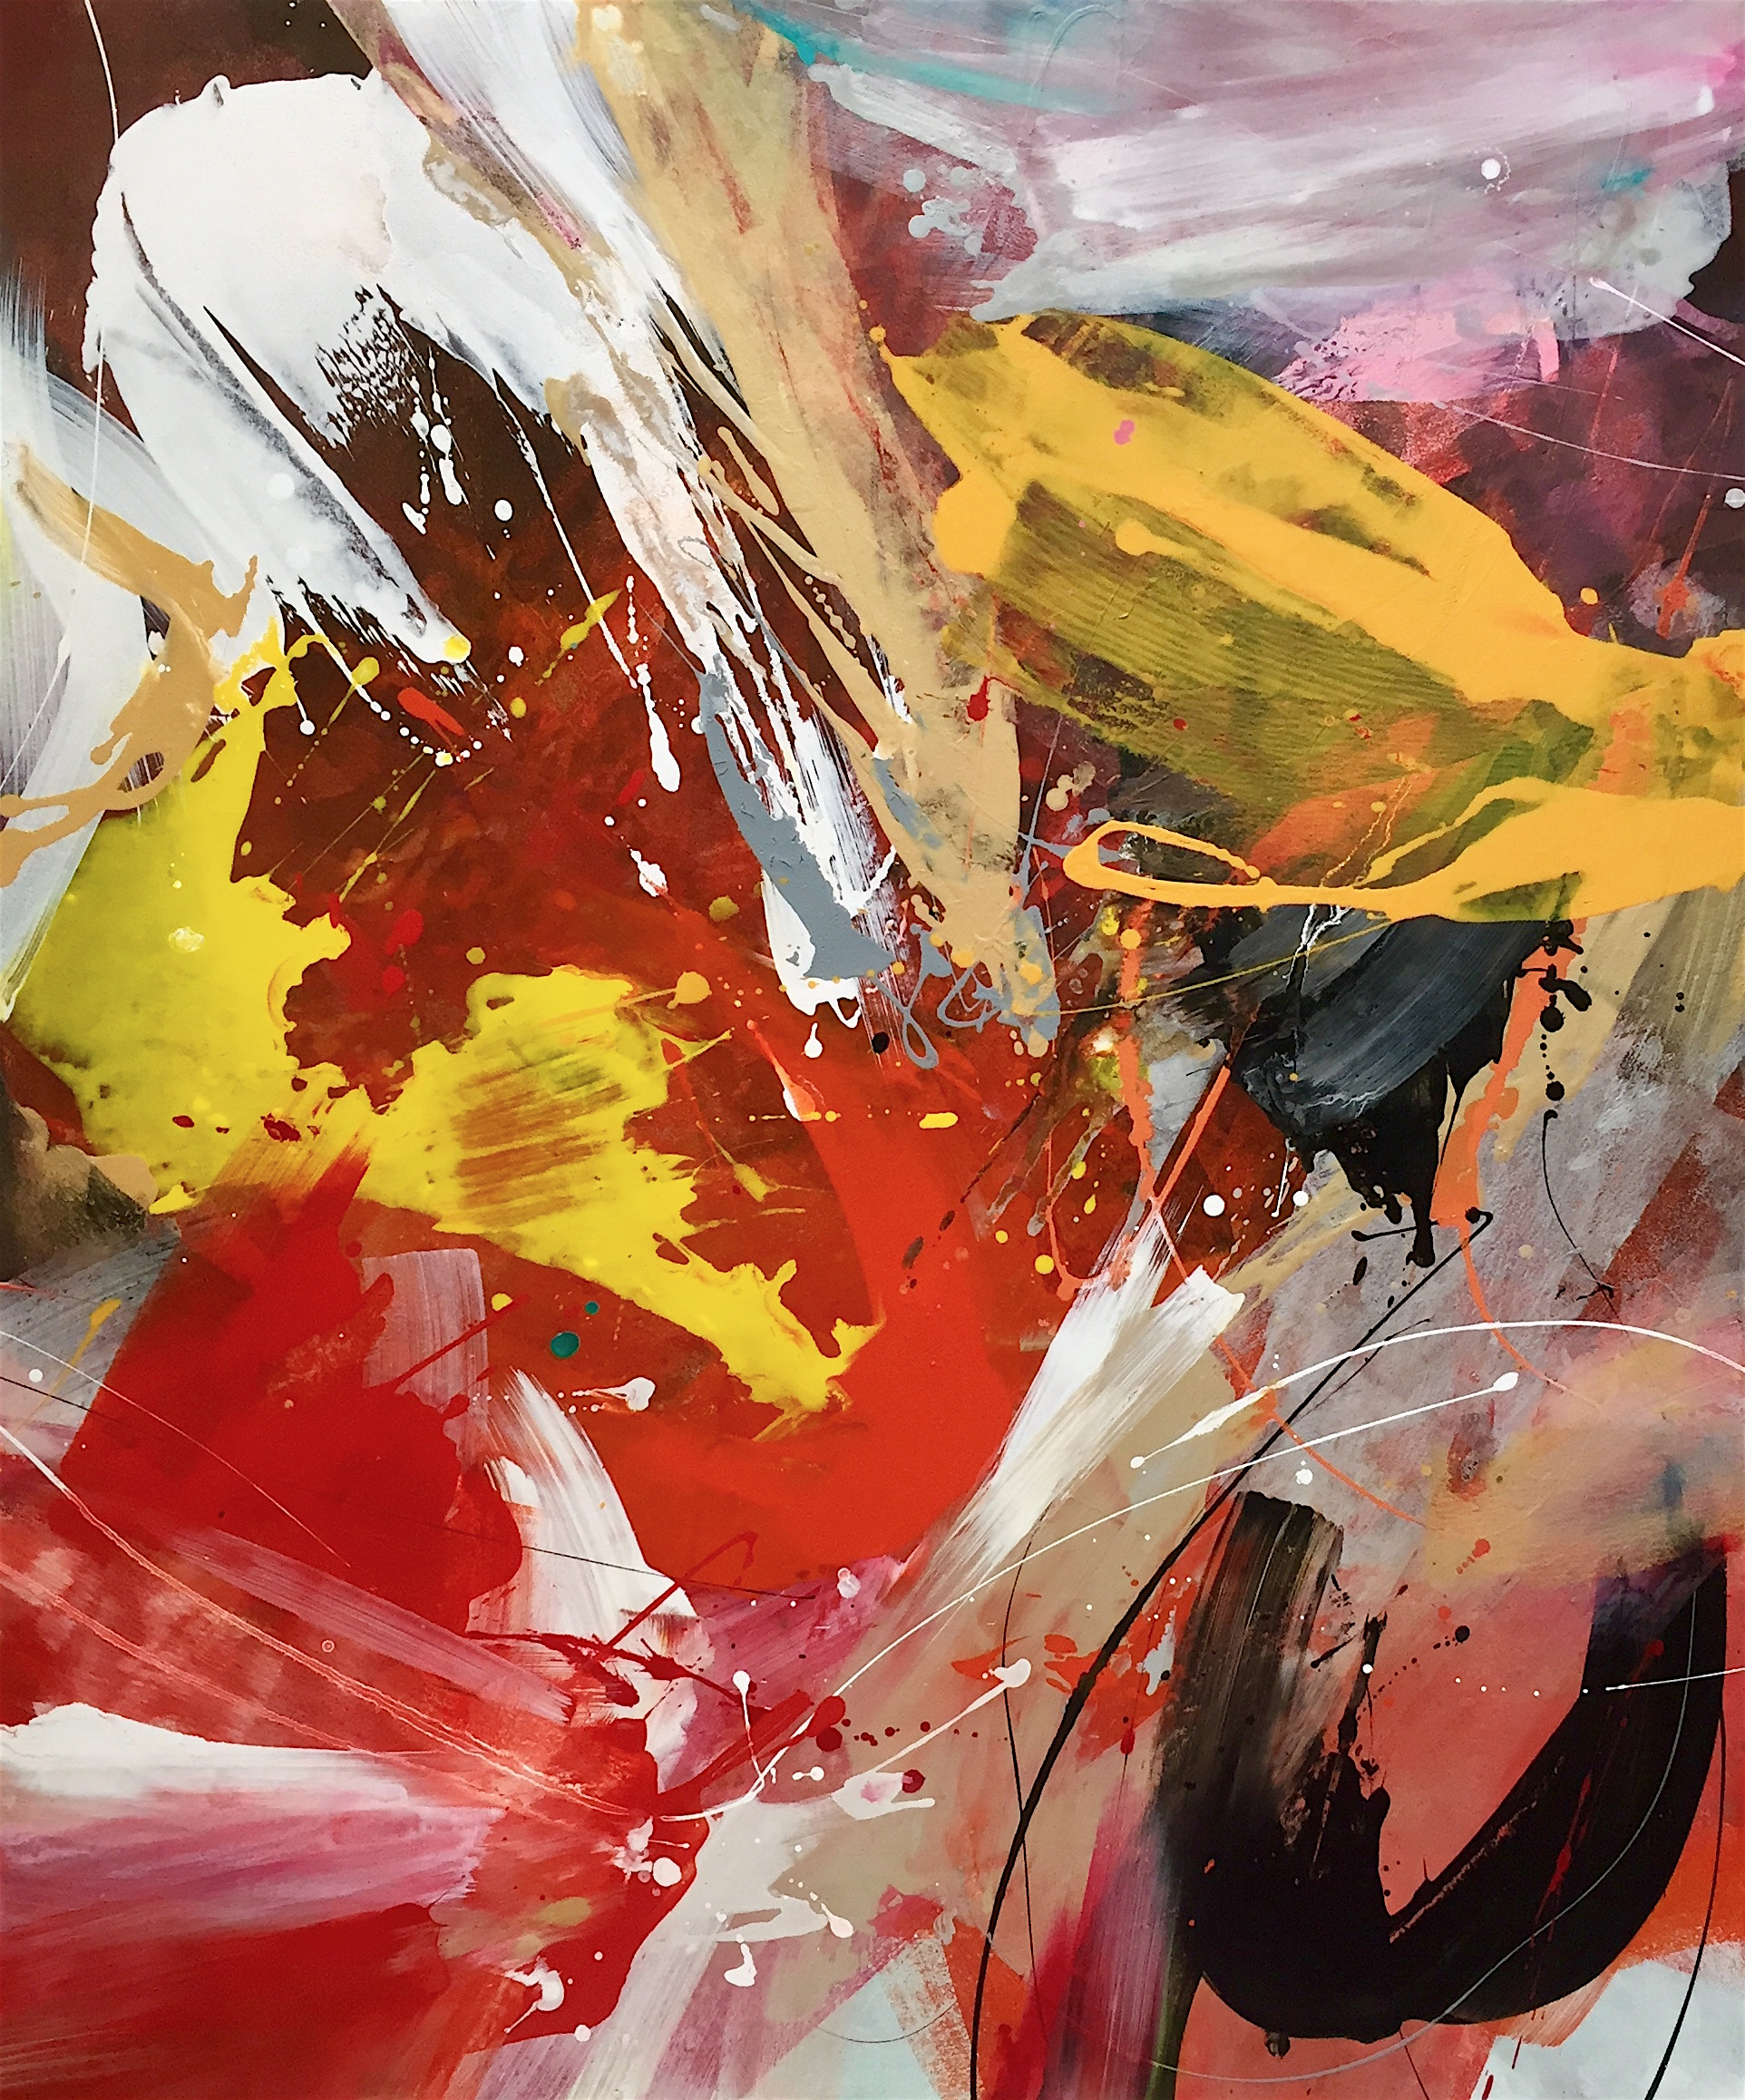 2020 Milanda de Mont Freespaces Acrylic & Enamel on canvas 100 x 120cm